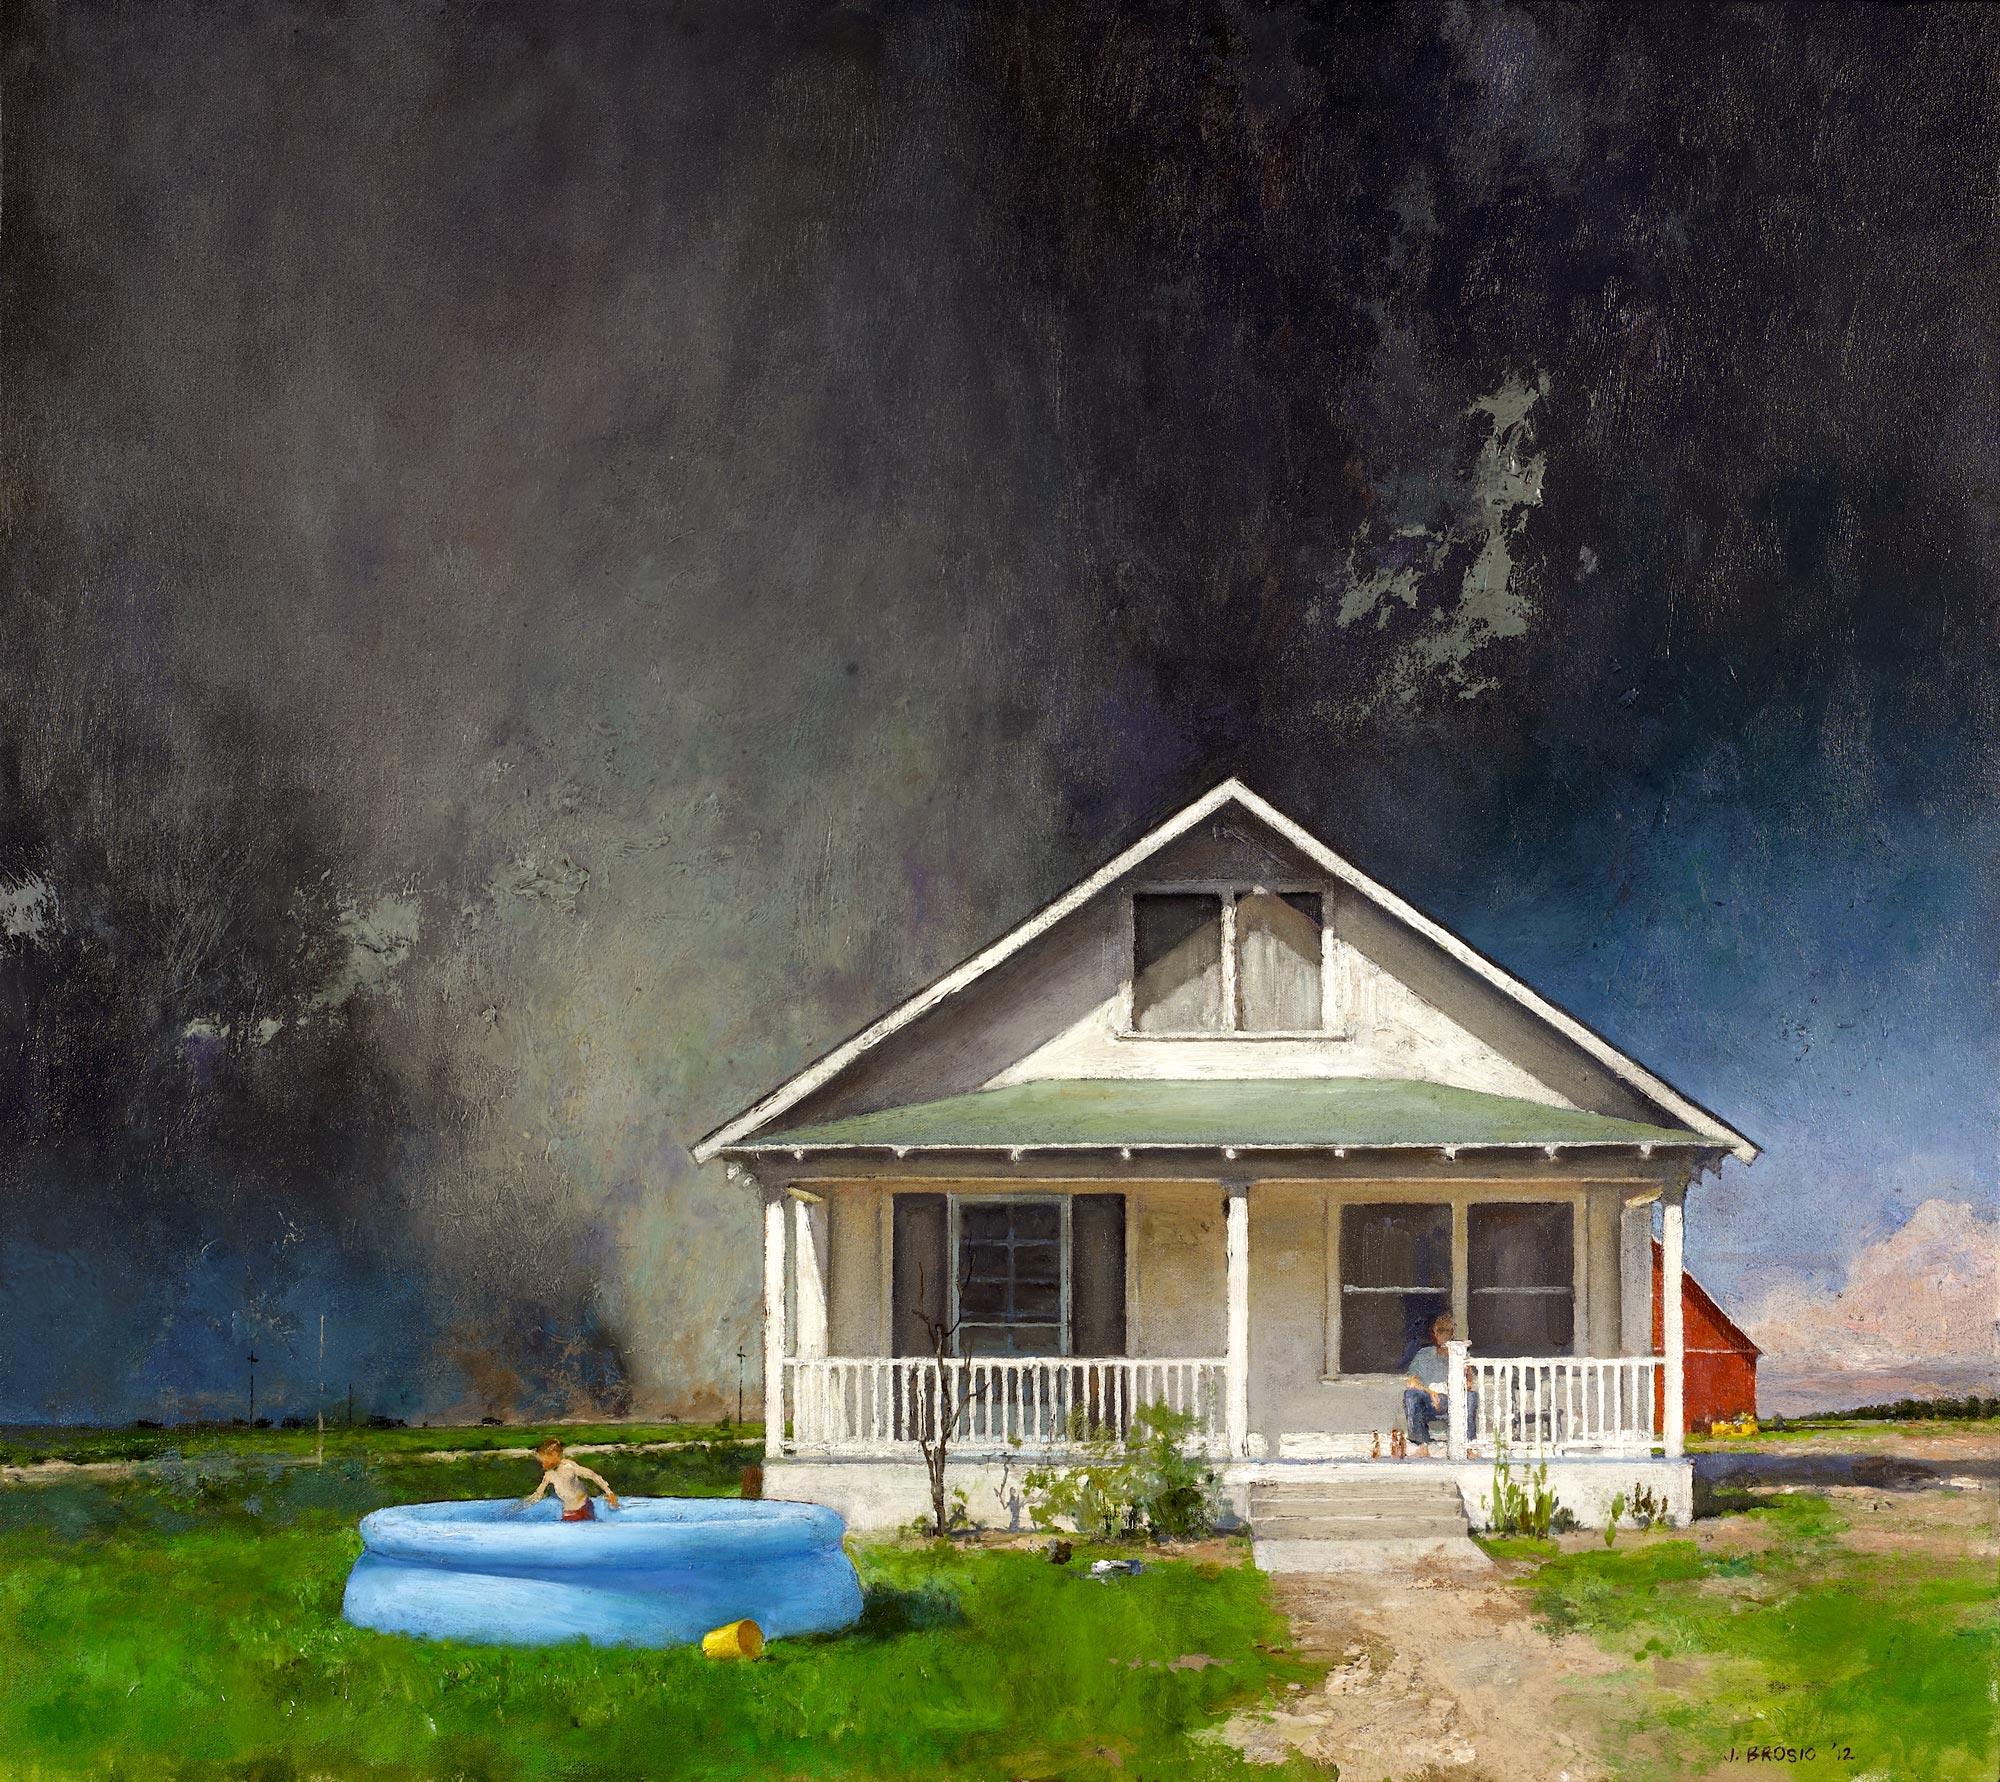 Terrarium, 32 x 36, oil on canvas, 2012